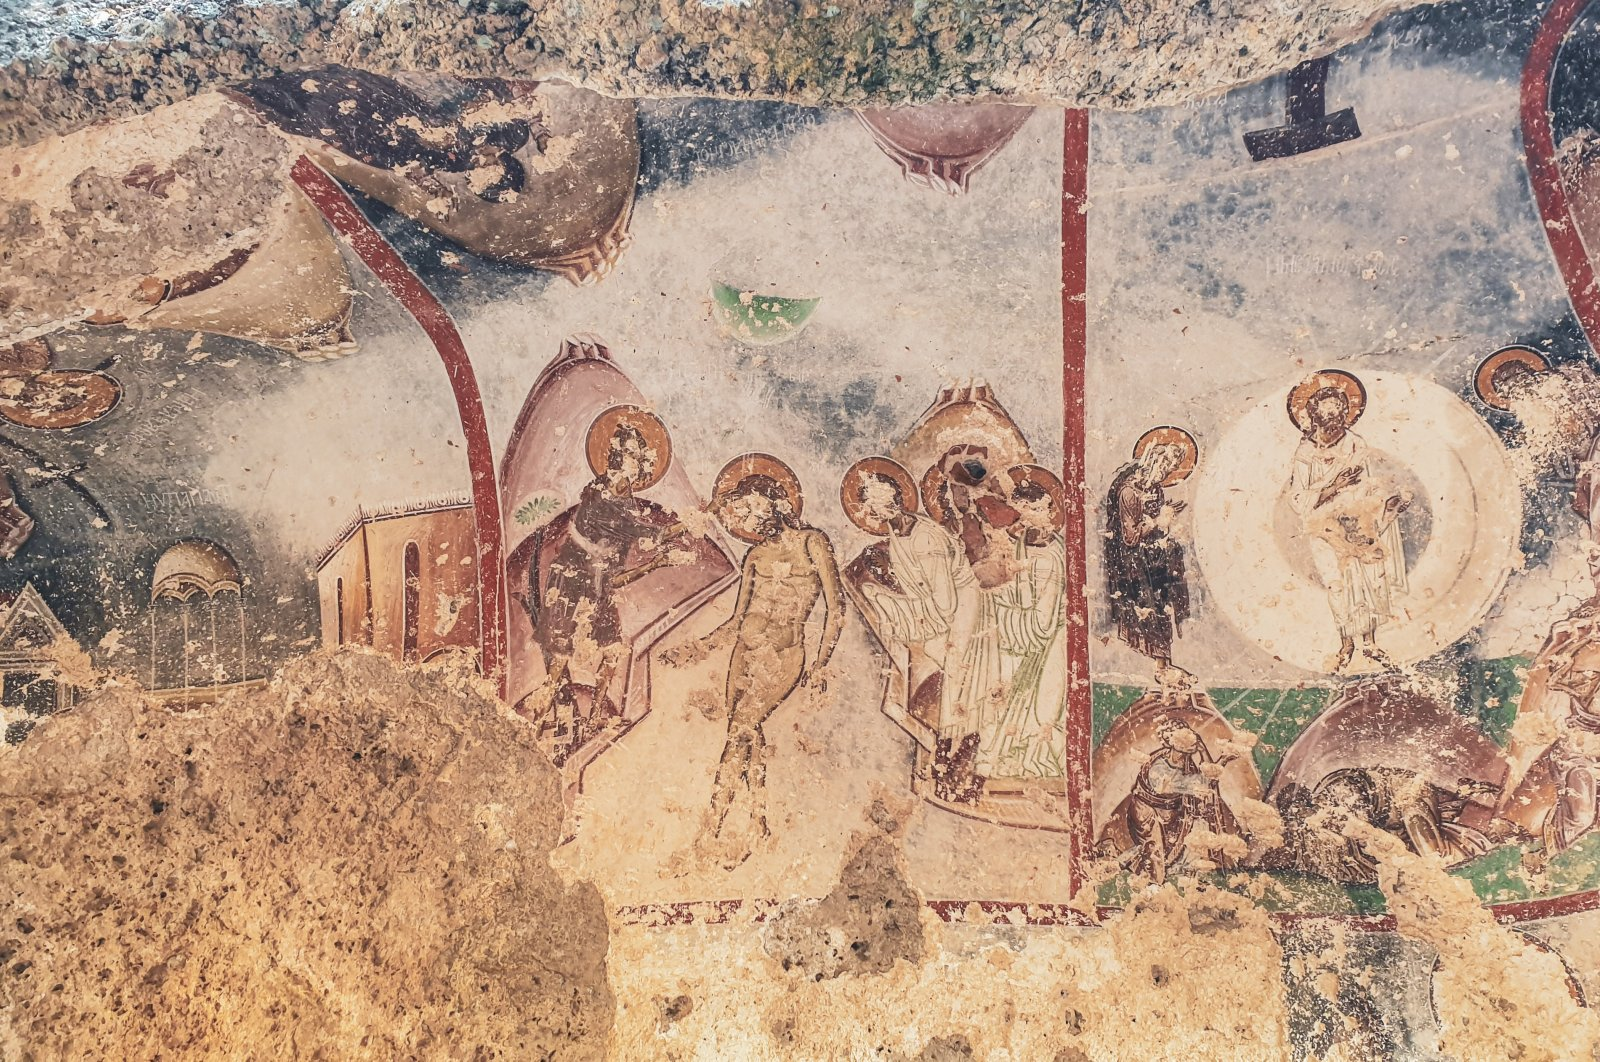 Frescoes located on the northeast side of the Yediler Monastery depict scenes from Jesus Christ's life, Muğla, Turkey. (Photo by Argun Konuk)